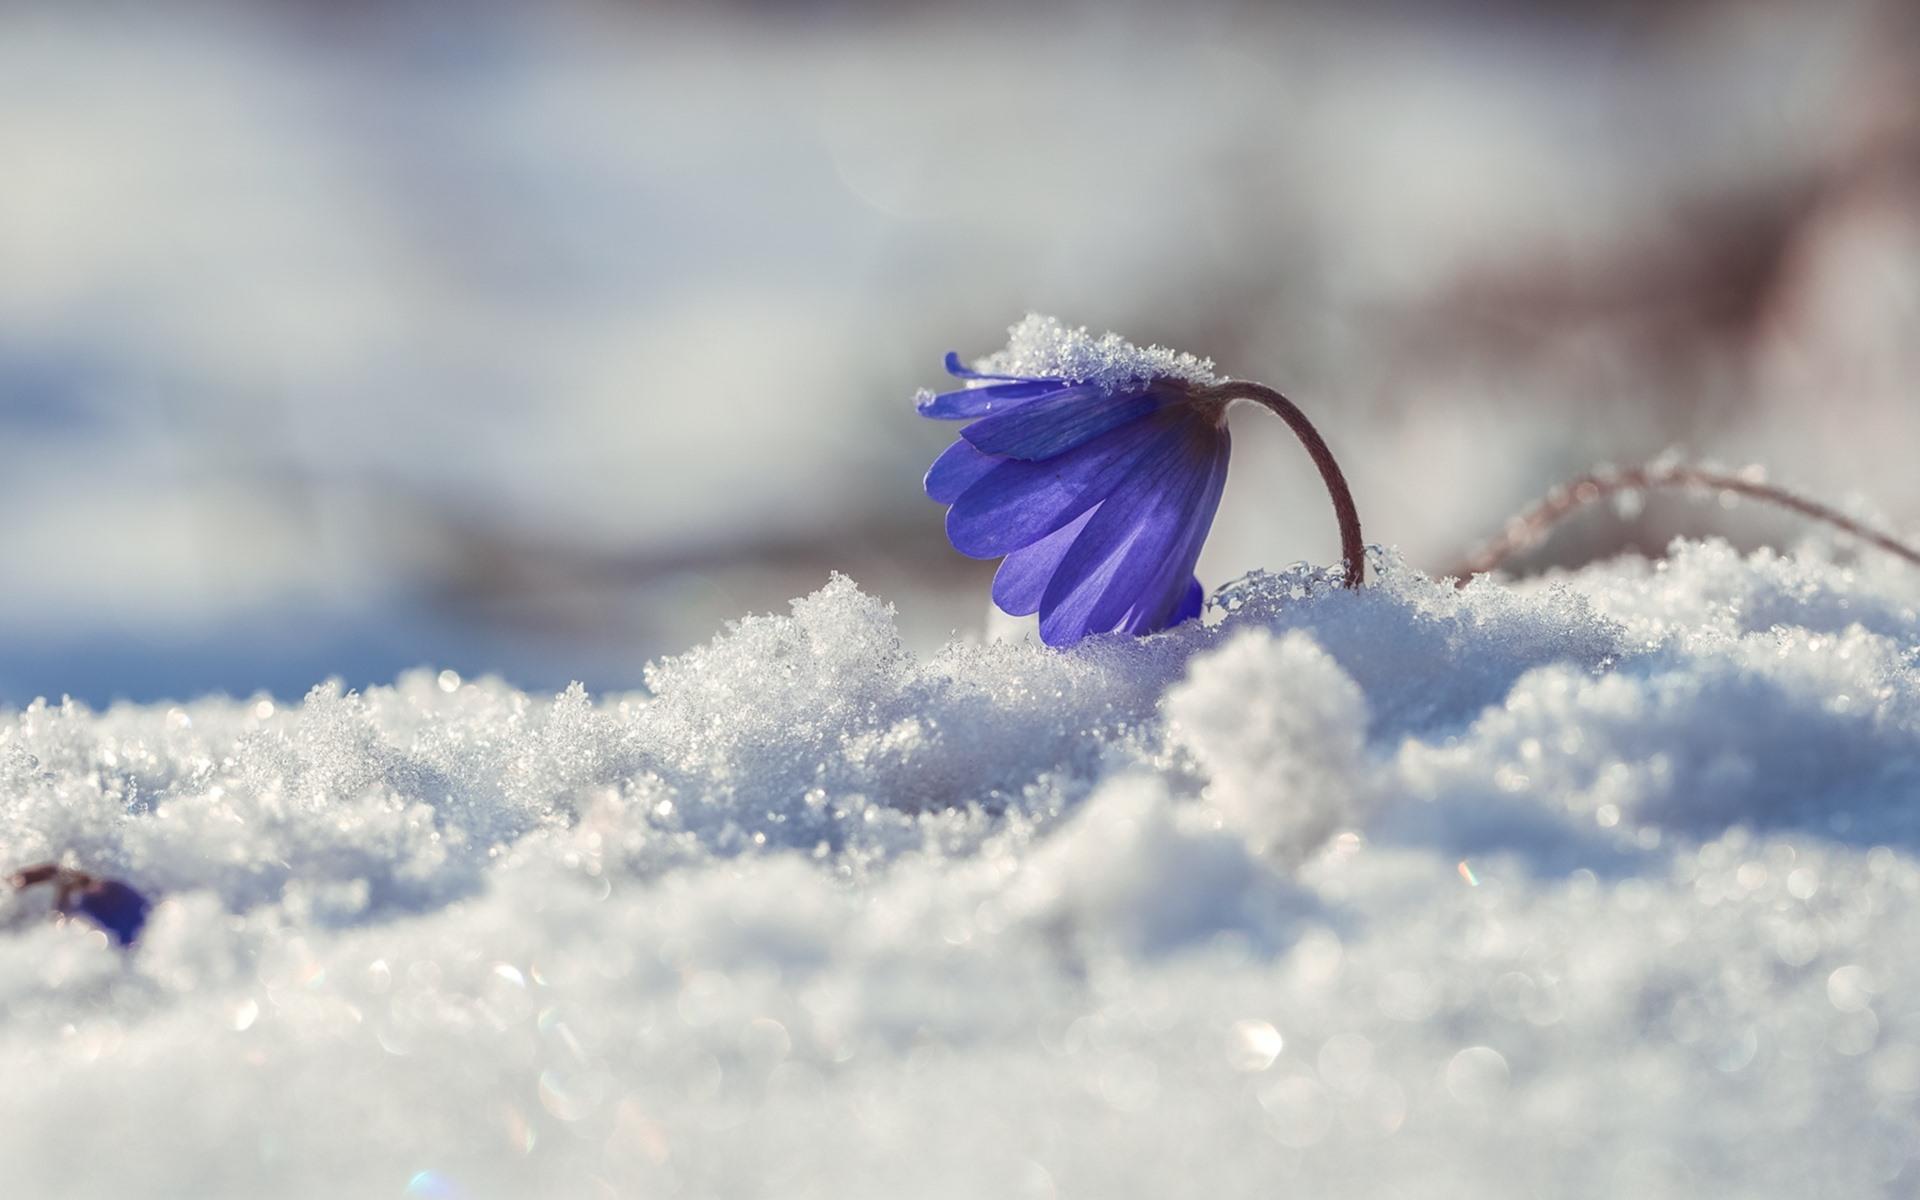 Wallpaper Blue Flower Primrose Snow Winter 1920x1200 Hd